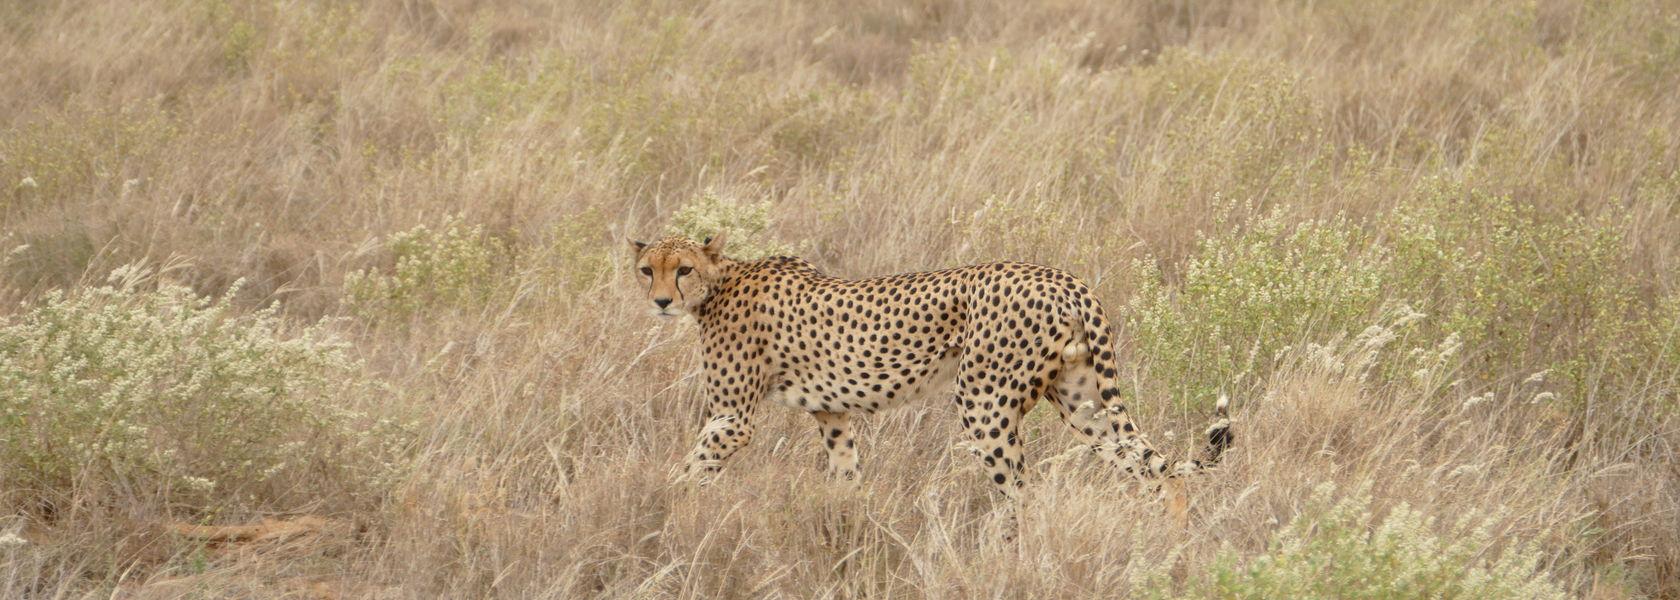 Kenia reisinformatie | Matoke Tours